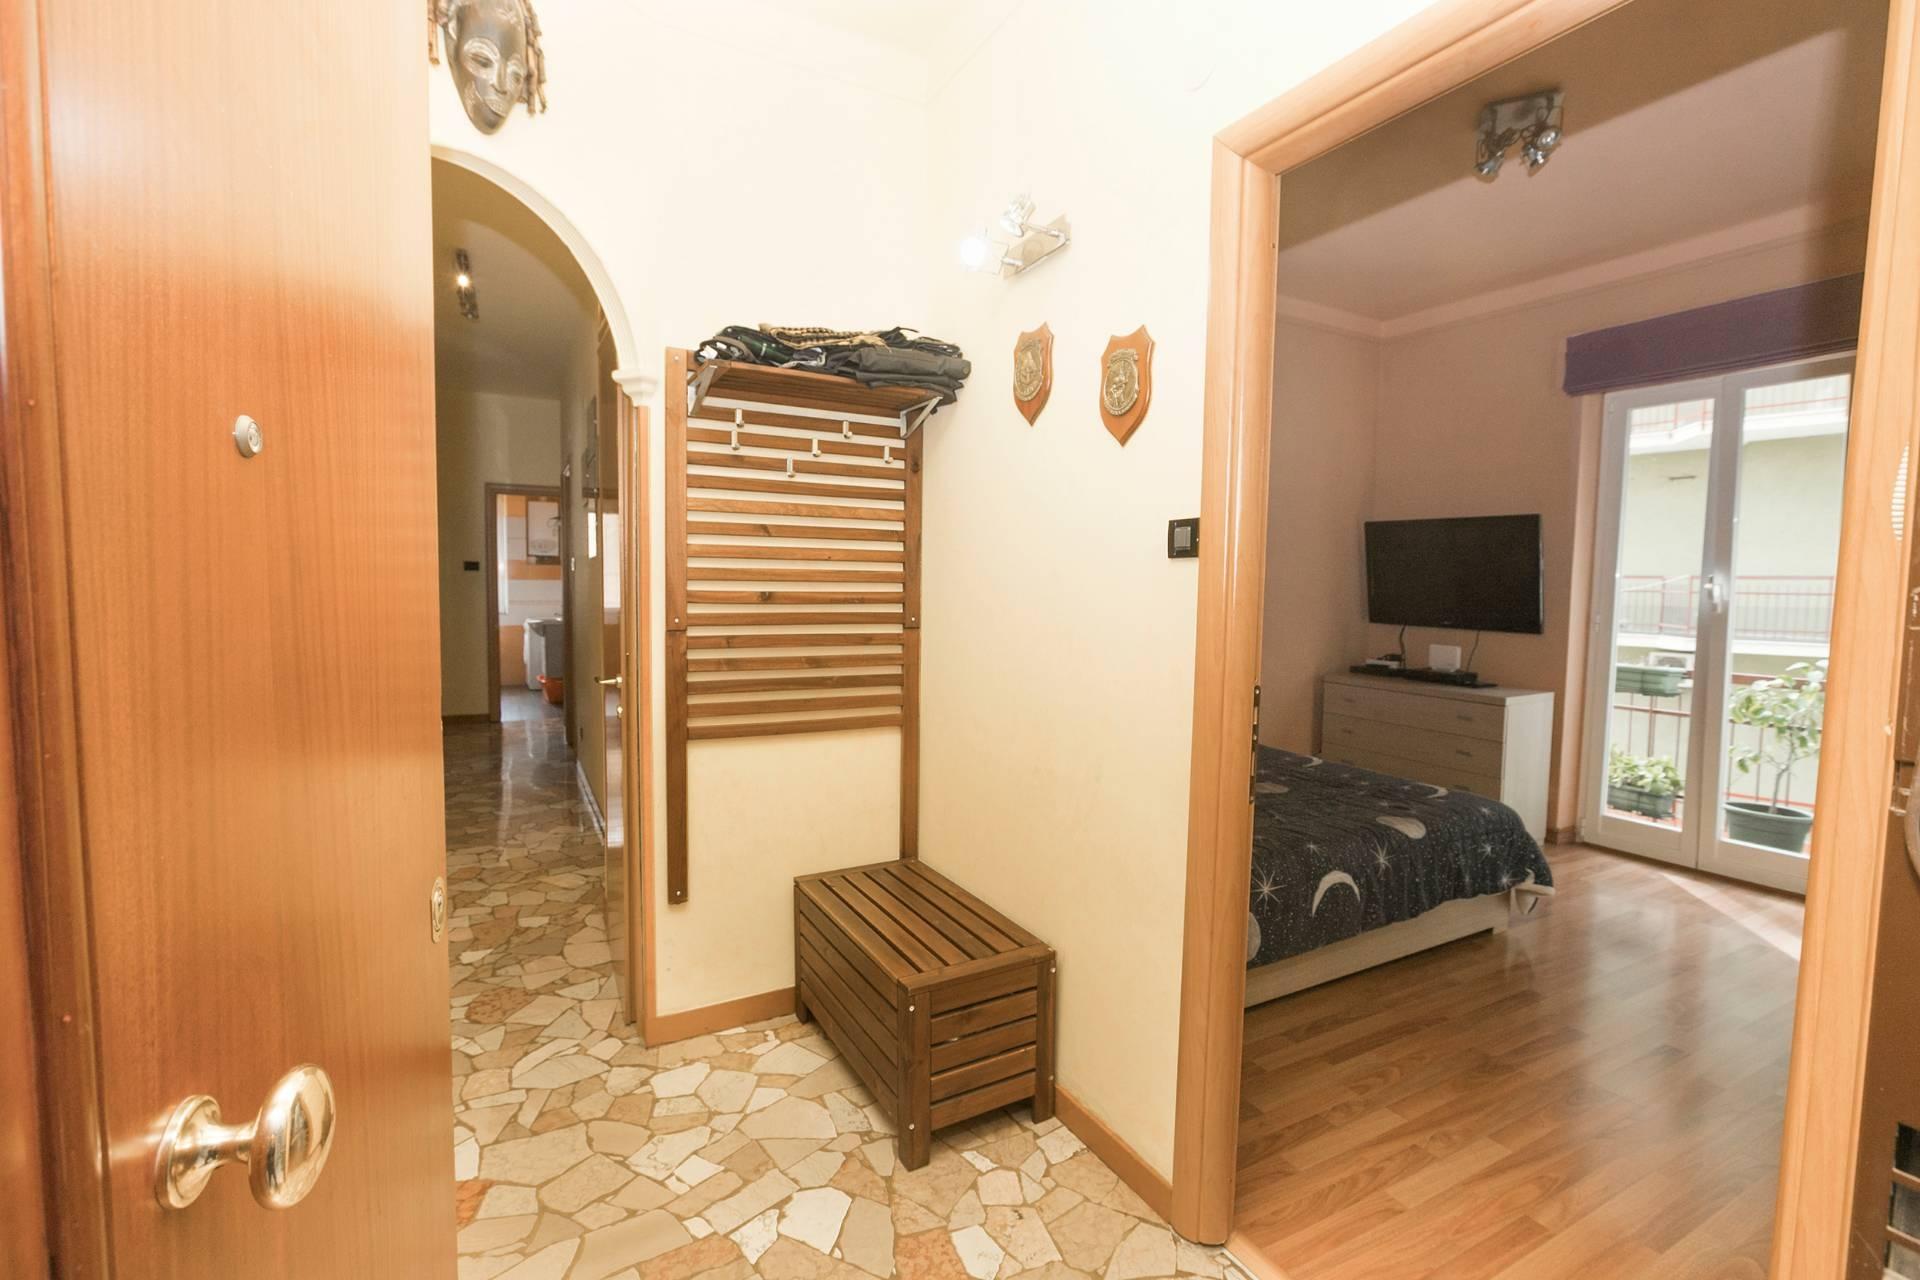 Appartamento, 72 Mq, Vendita - Genova (Genova)